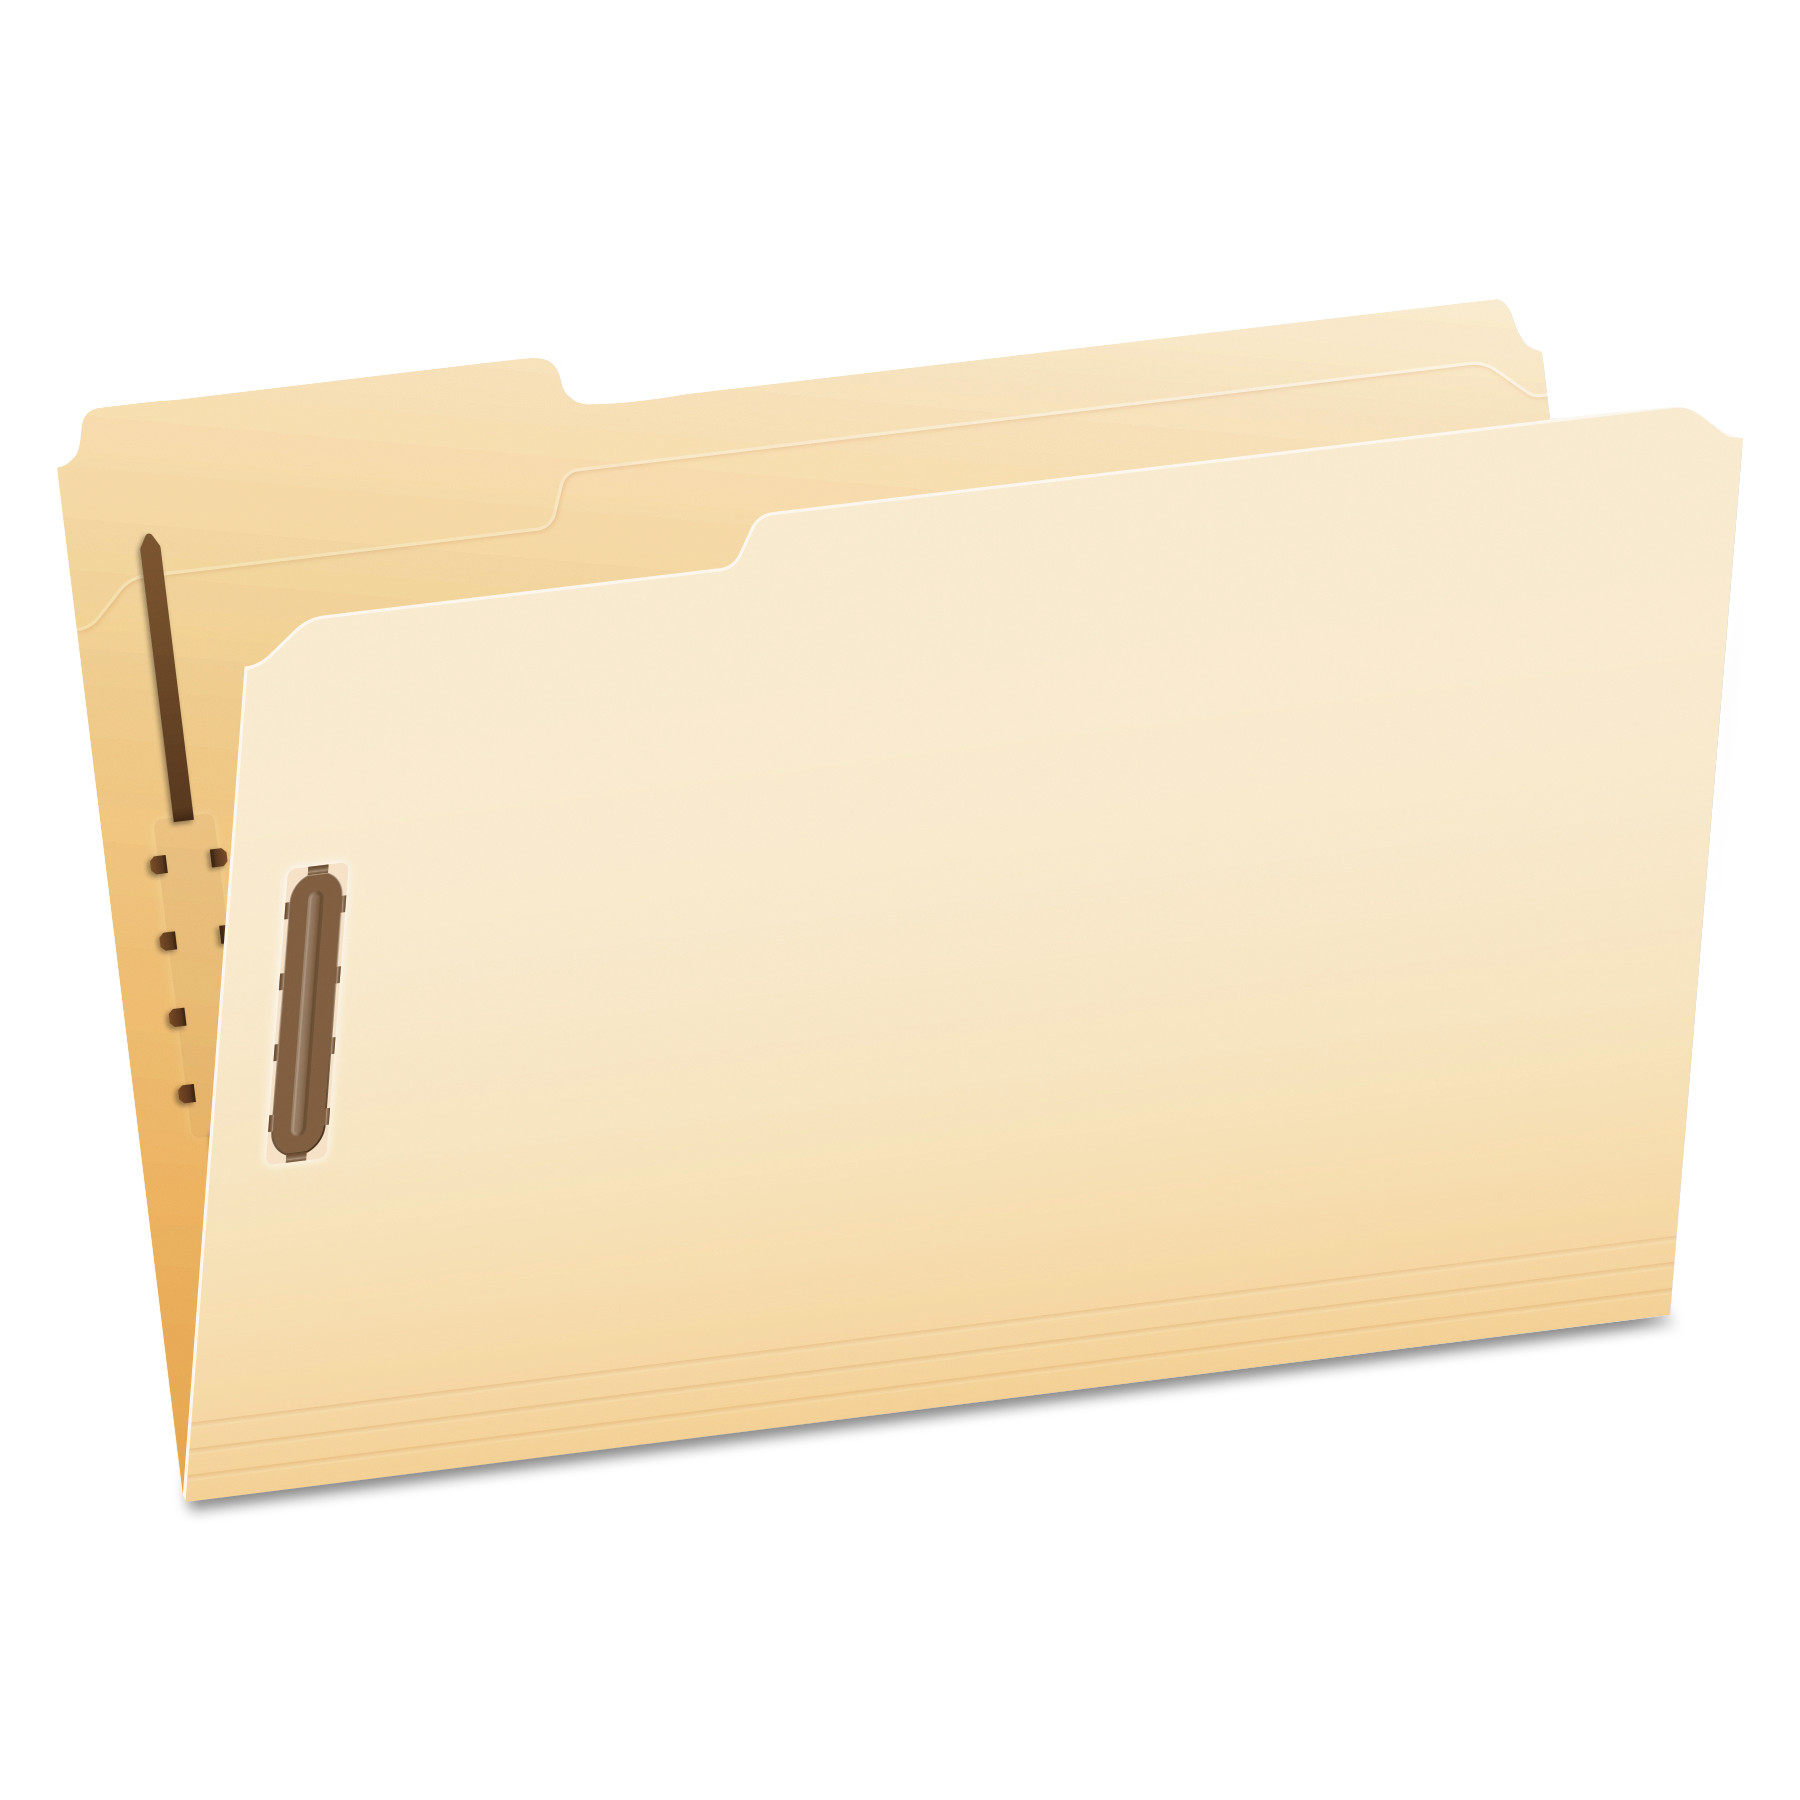 PICK YOUR # OF FOLDERS Pendaflex File Folder Letter Size Manila 1//3-Cut Tab